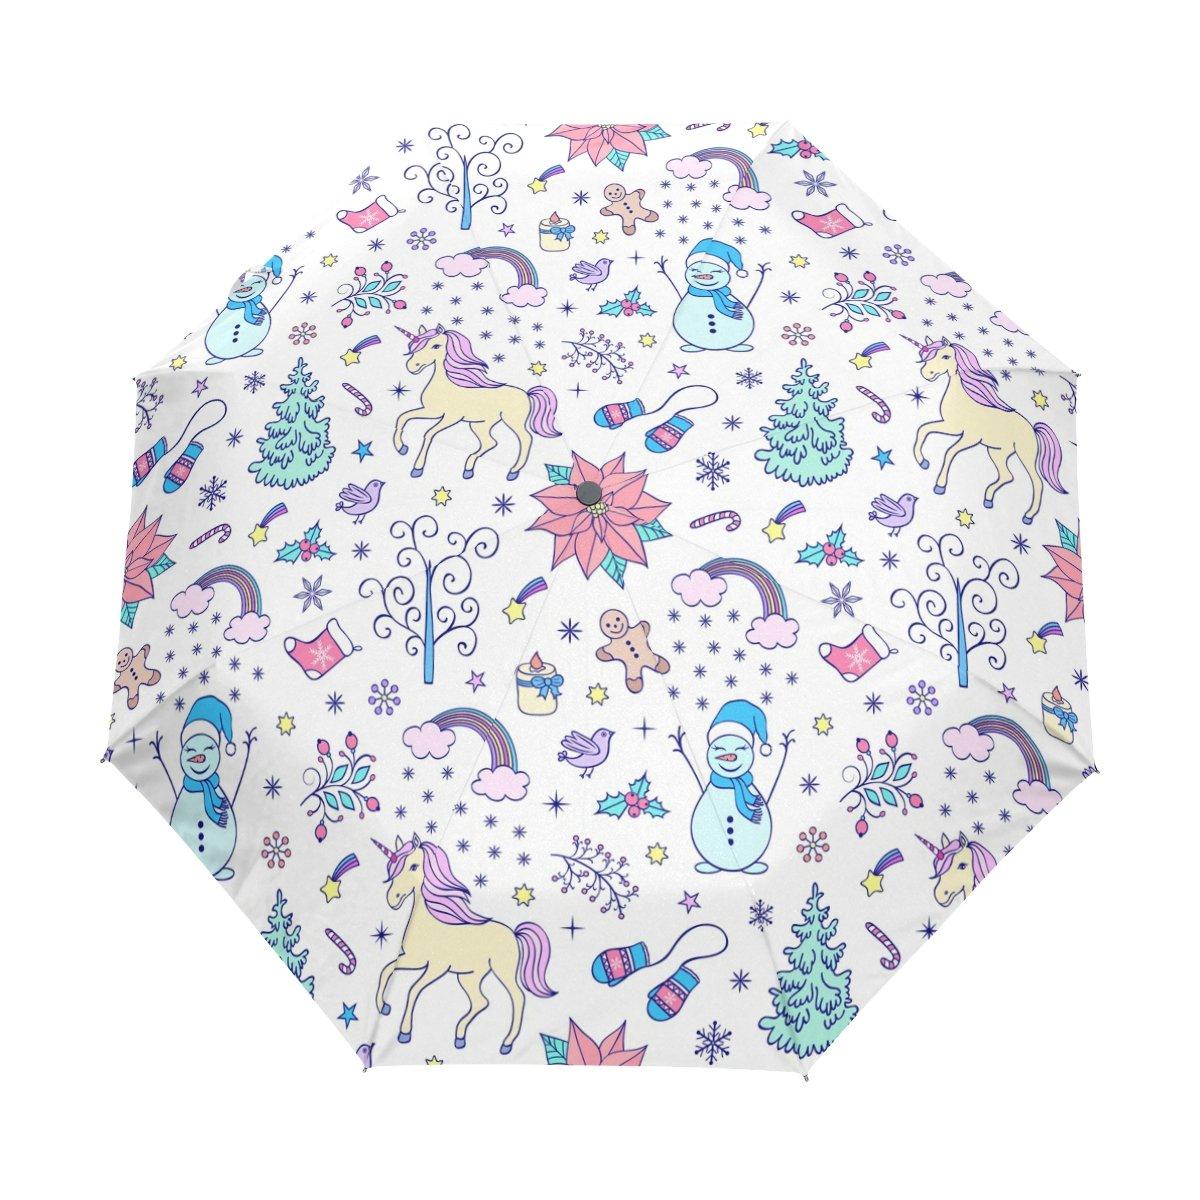 Senya Saobao防風と防雨トラベル傘自動開いて閉じFoldingクリスマスシームレスなパターンポータブル折りたたみ式太陽雨傘 B07FCY7MD5